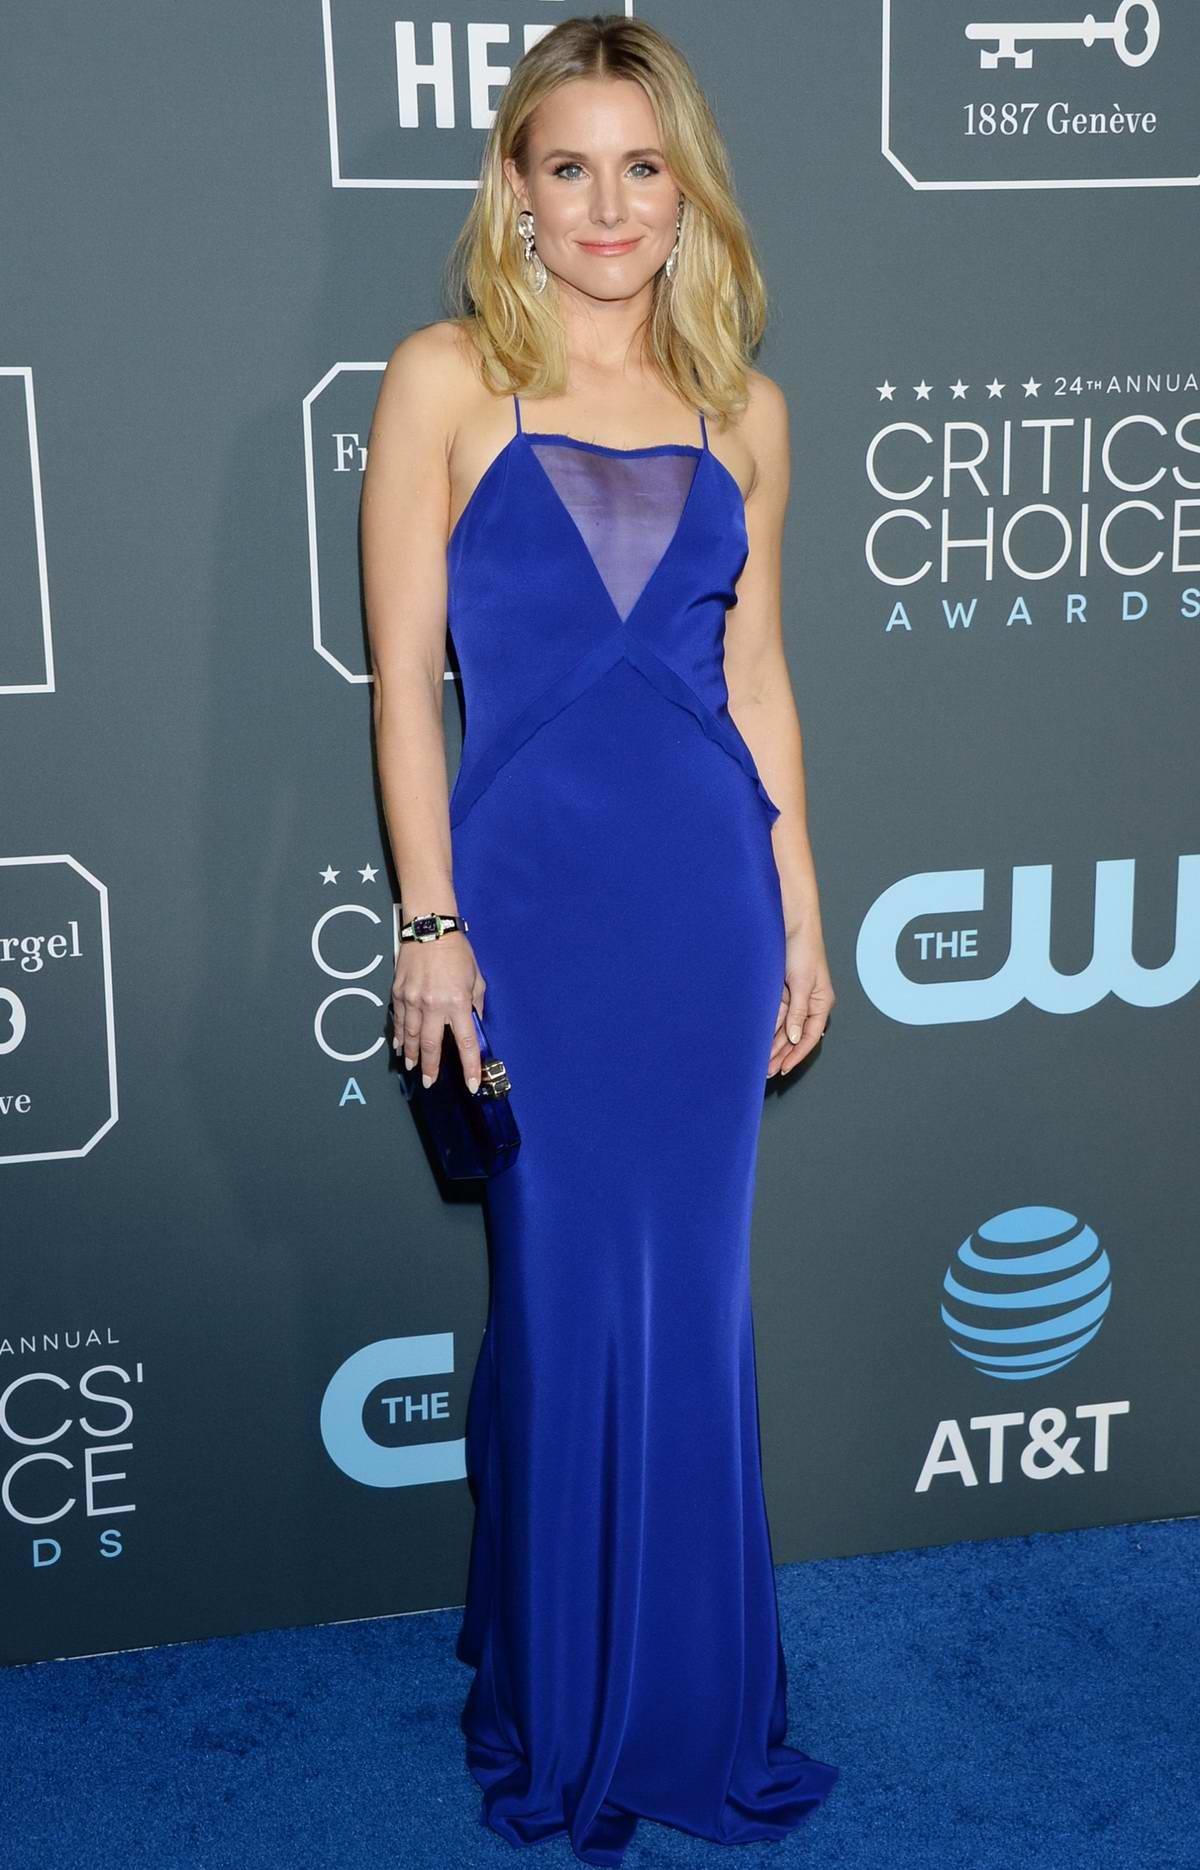 Kristen Bell attends the 24th Annual Critics' Choice Awards at Barker Hangar in Santa Monica, California